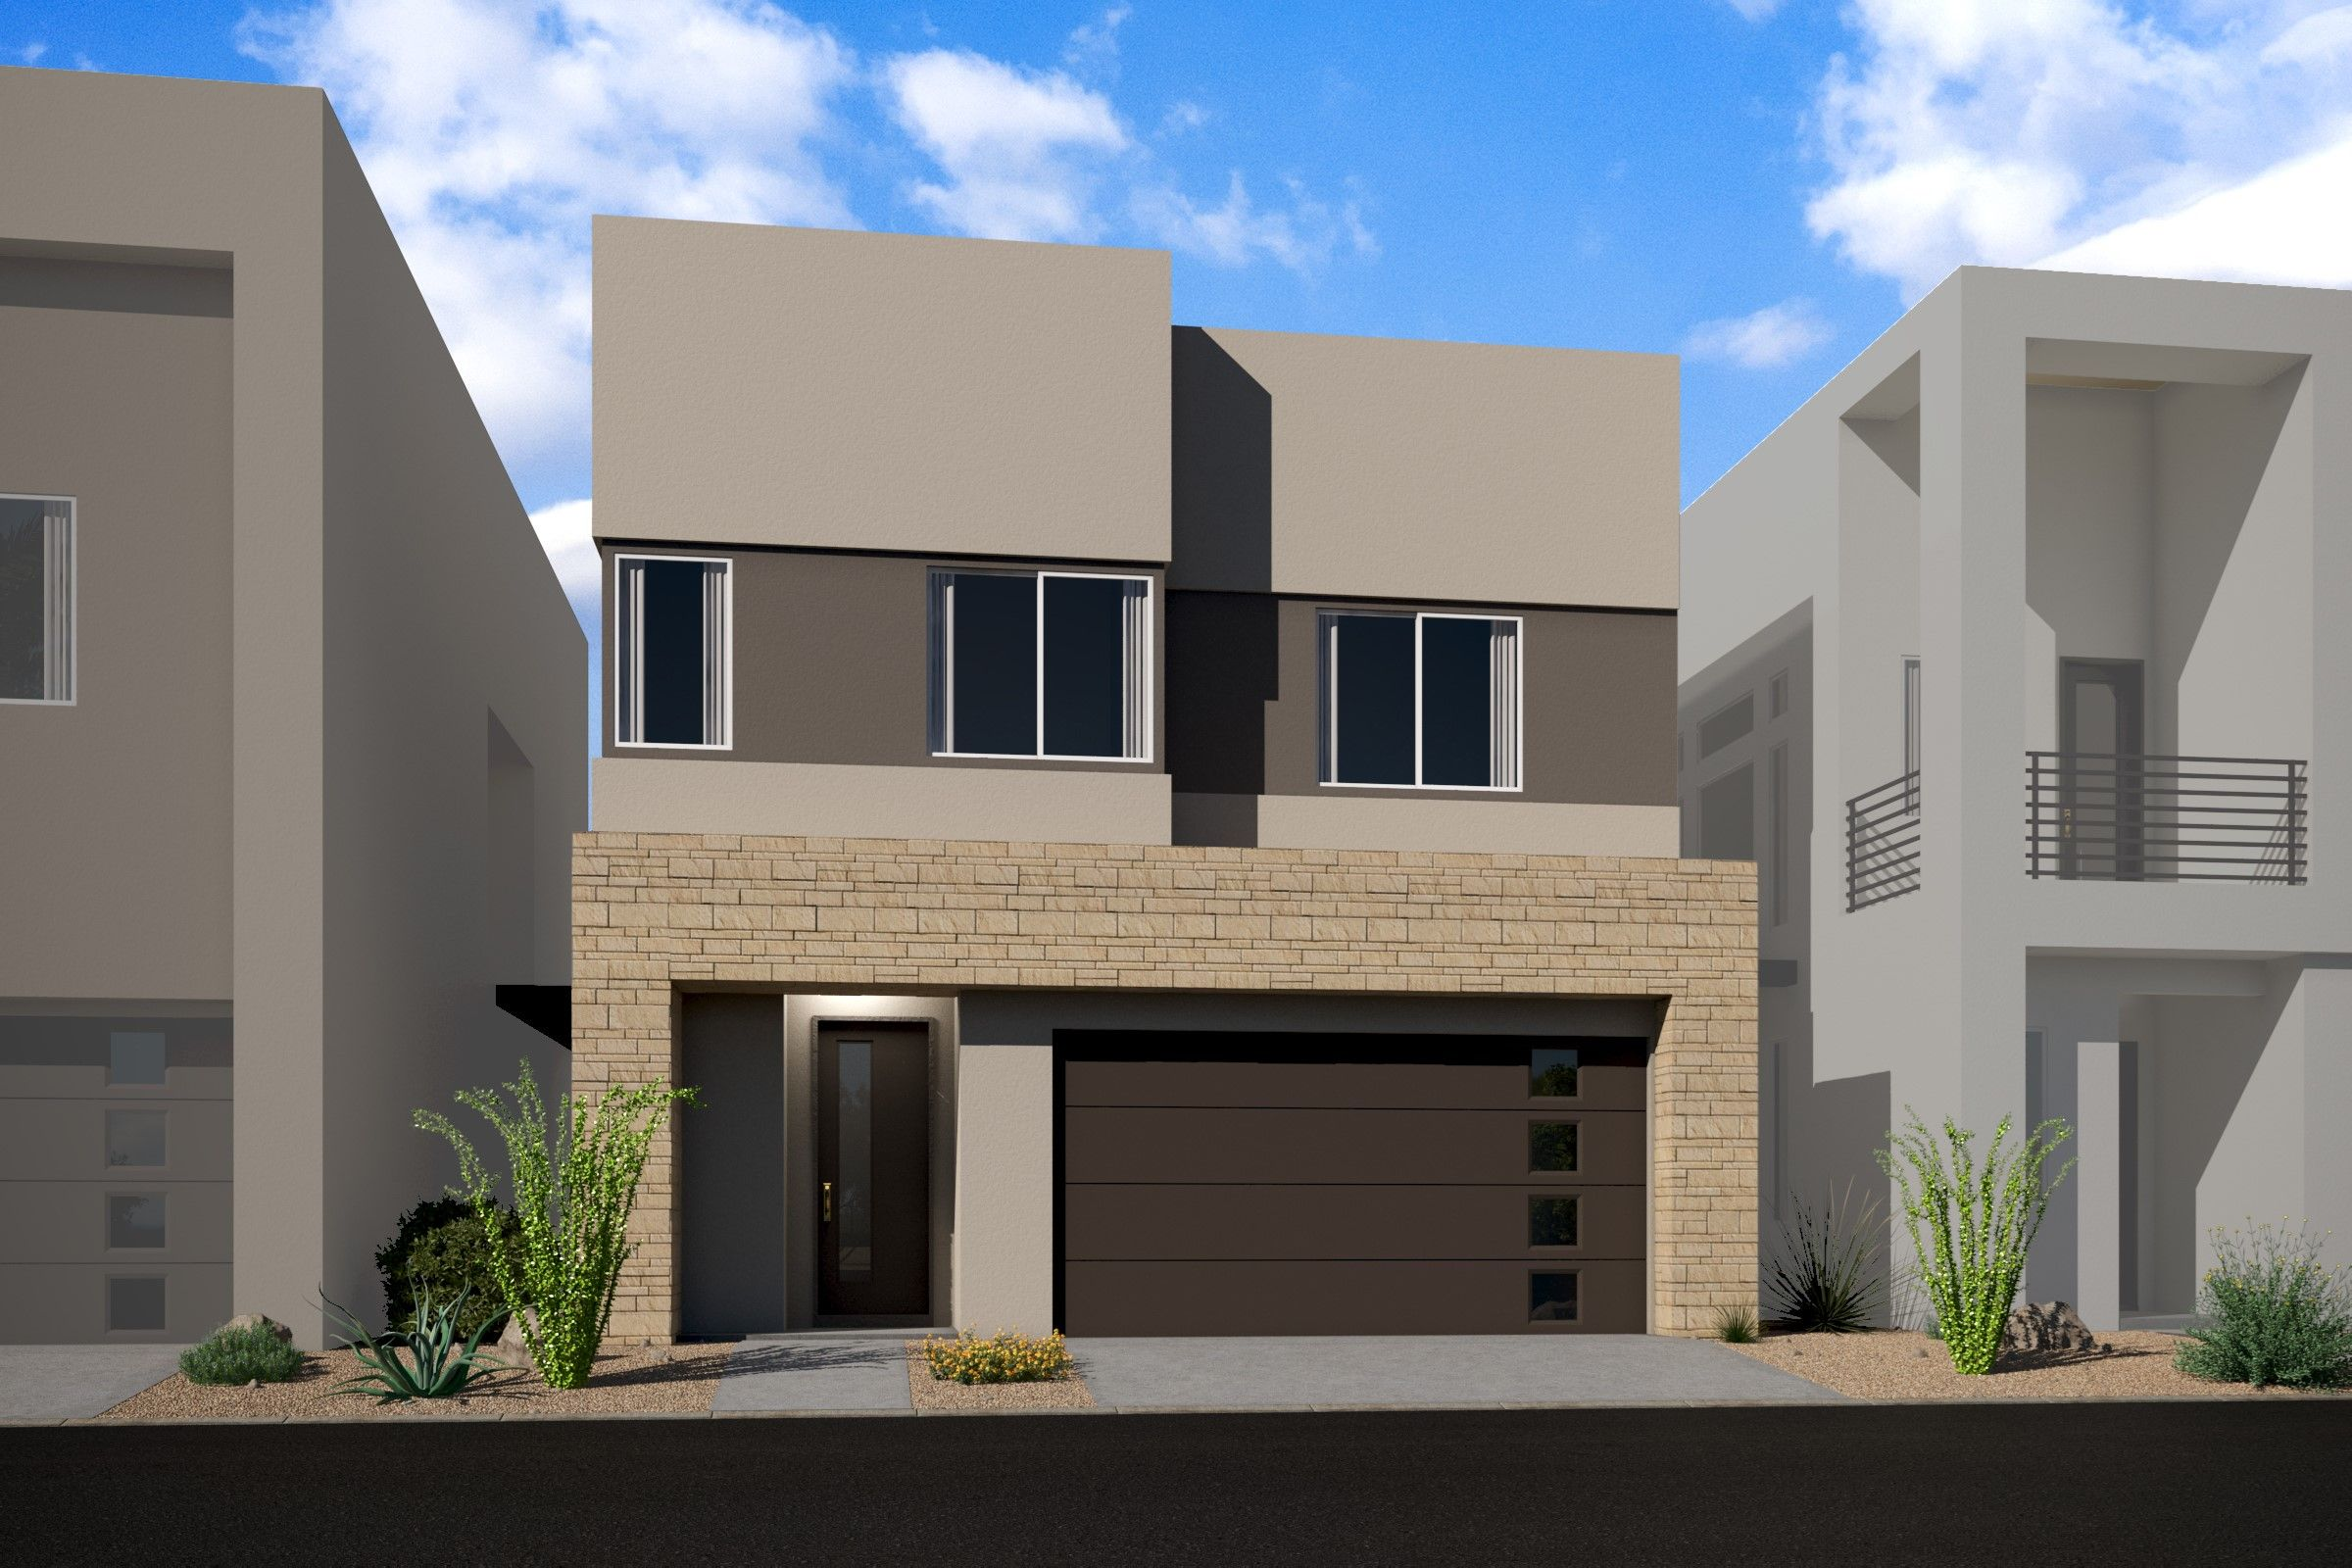 Single Family للـ Sale في Skye - Concerto 68th Street And Mcdowell Rd Scottsdale, Arizona 85251 United States